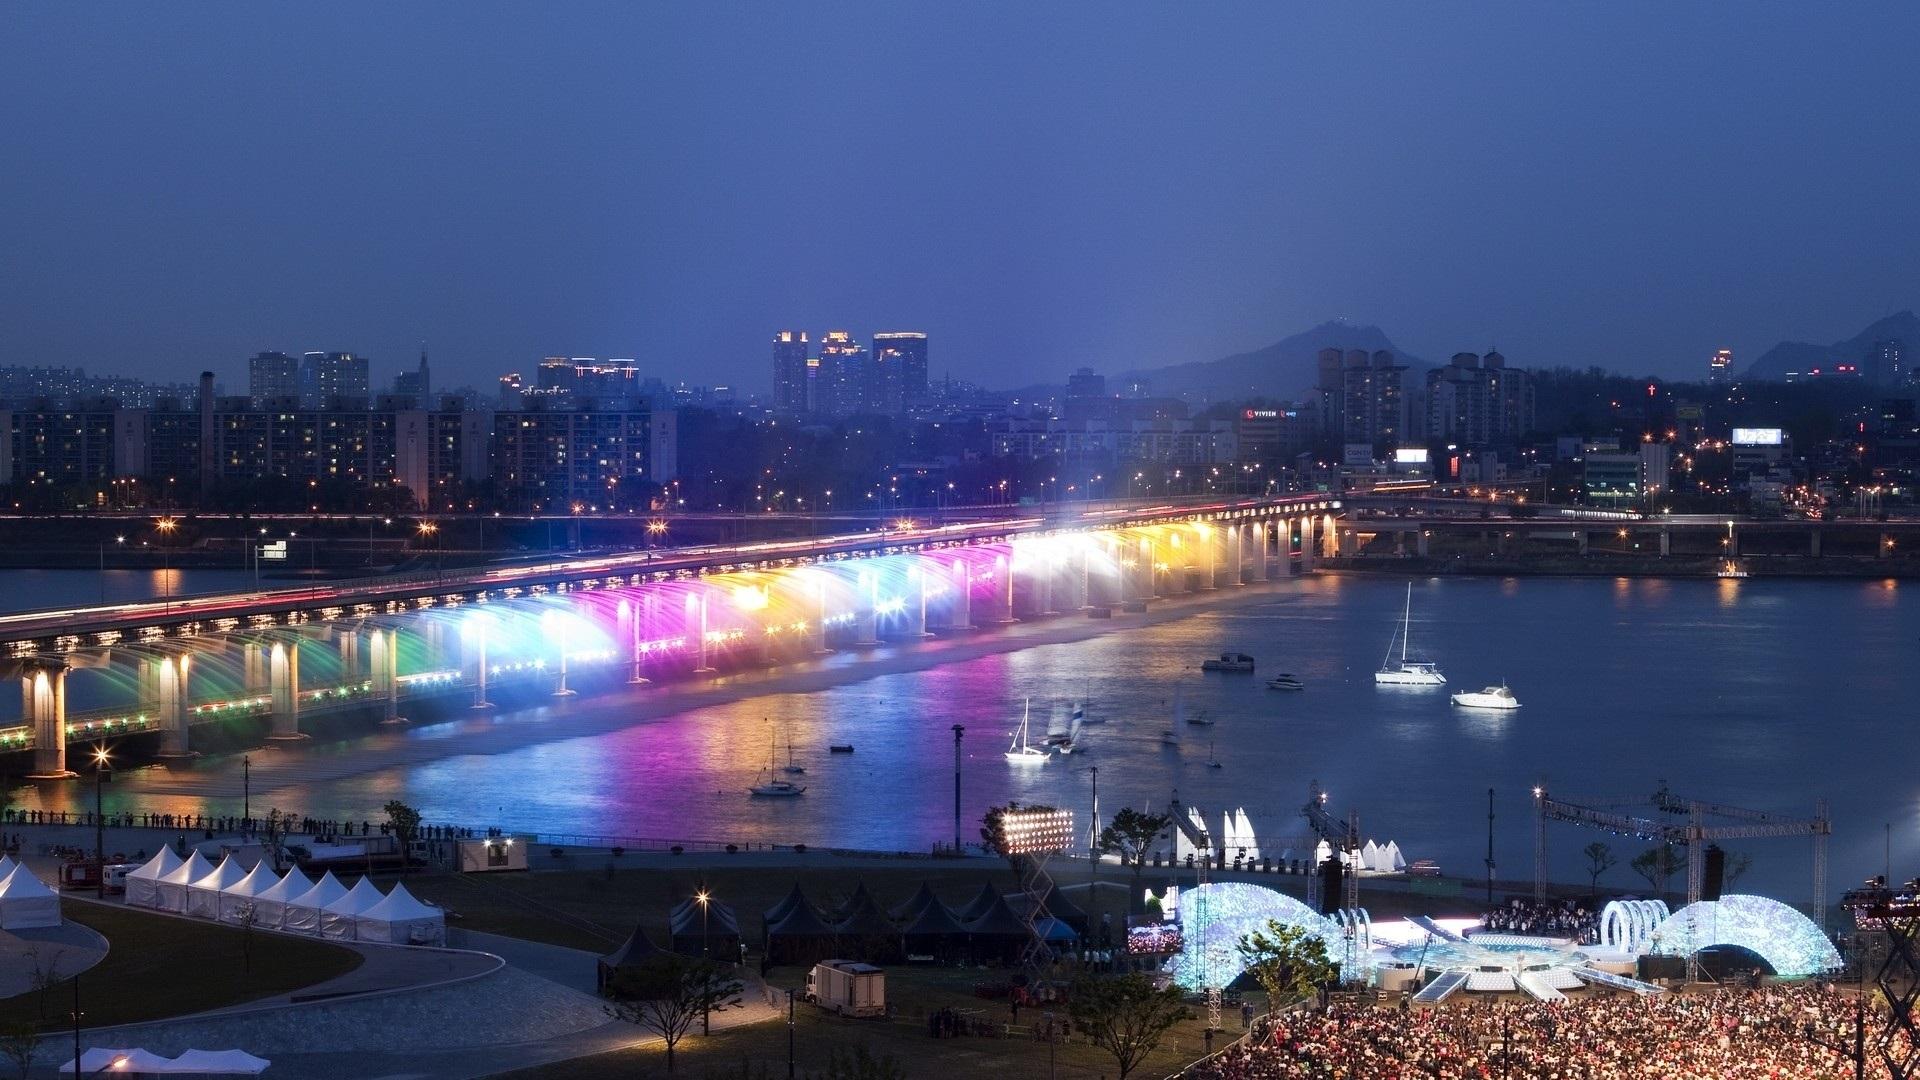 Wallpaper Han River Bridge Rainbow Illumination Night